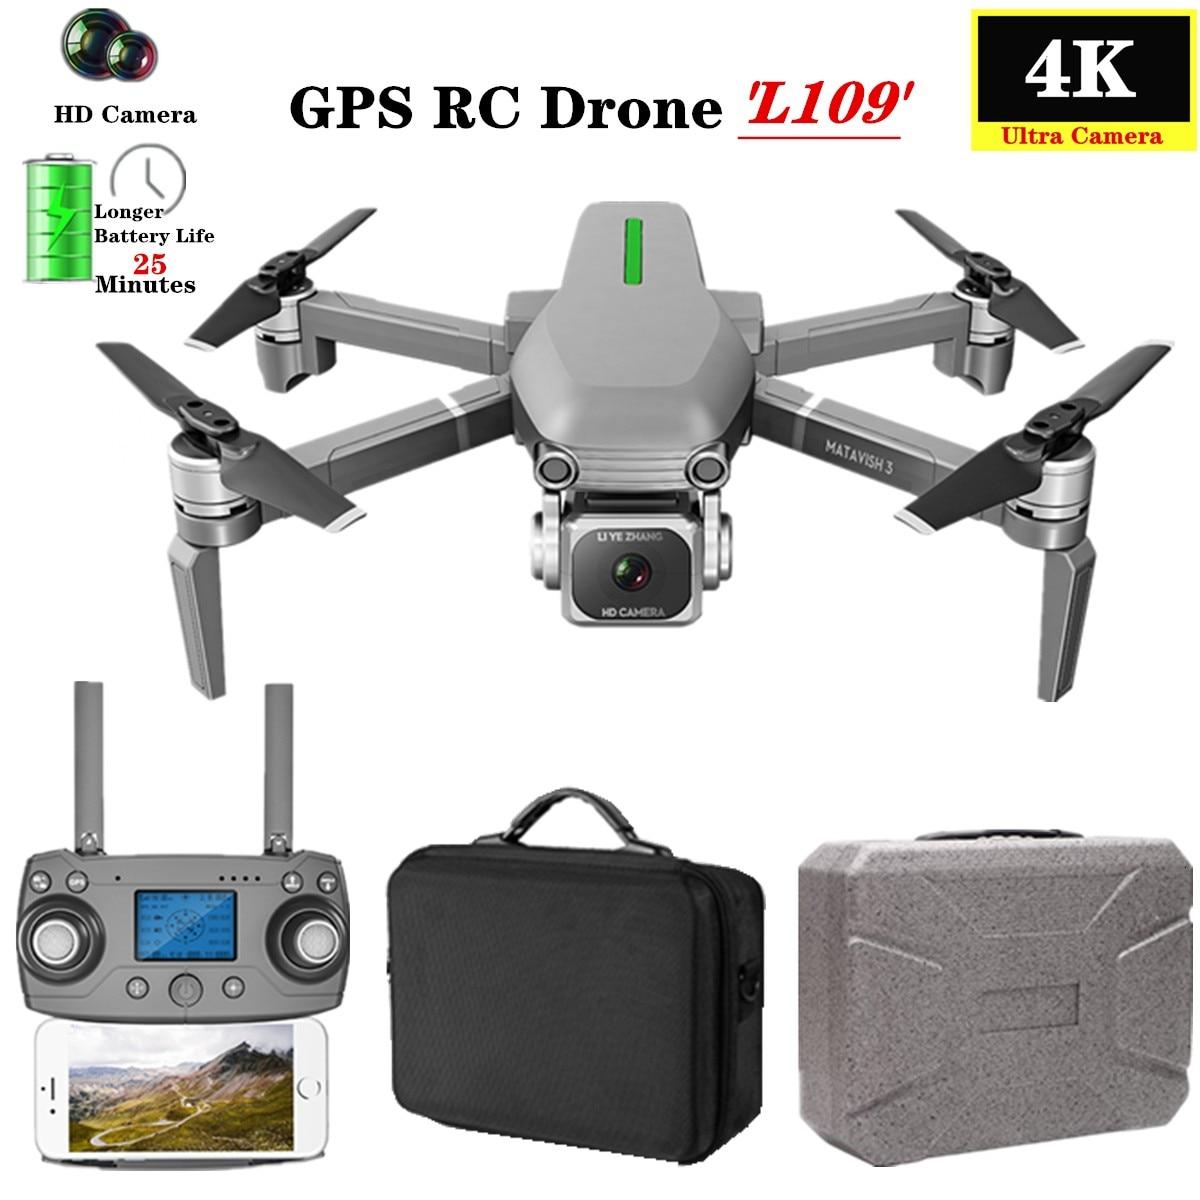 L109 S RC Drone Quadcopter 4K HD Cámara 5G WiFi GPS Drones con una tecla de retorno altura mantener 800m WiFi imagen distancia dron Juguetes